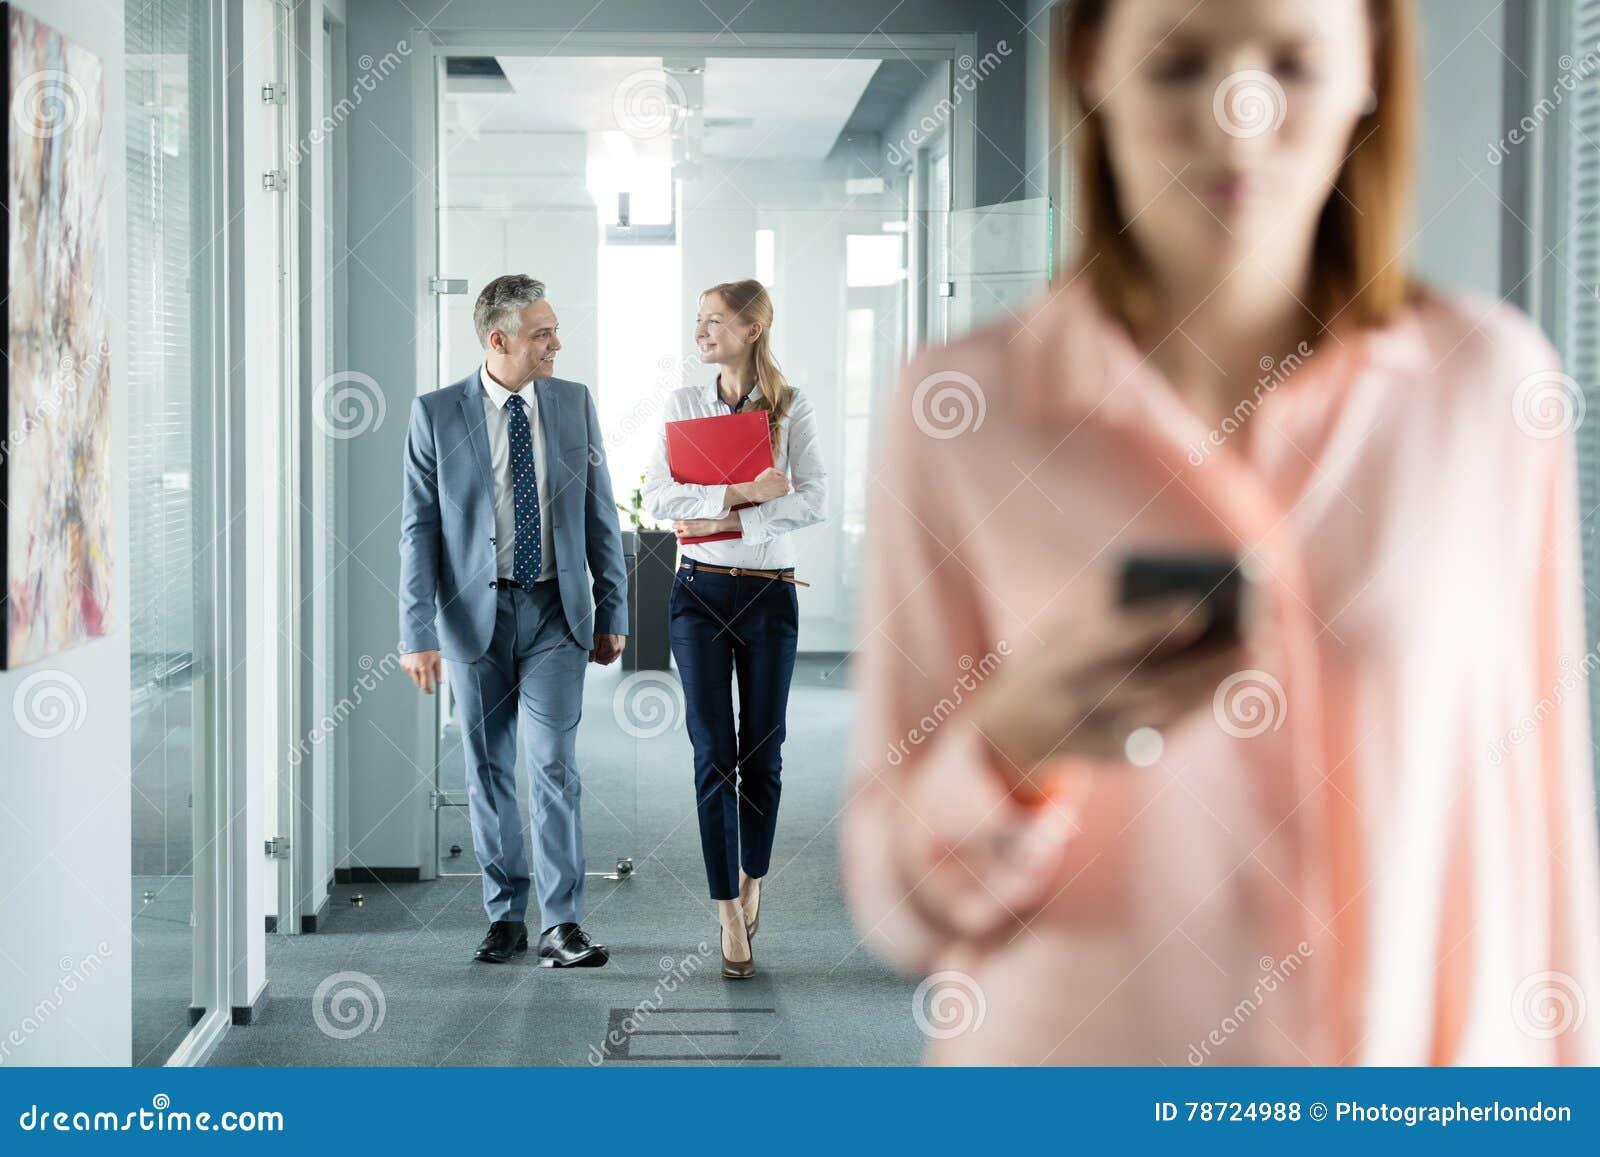 people in office corridor royalty